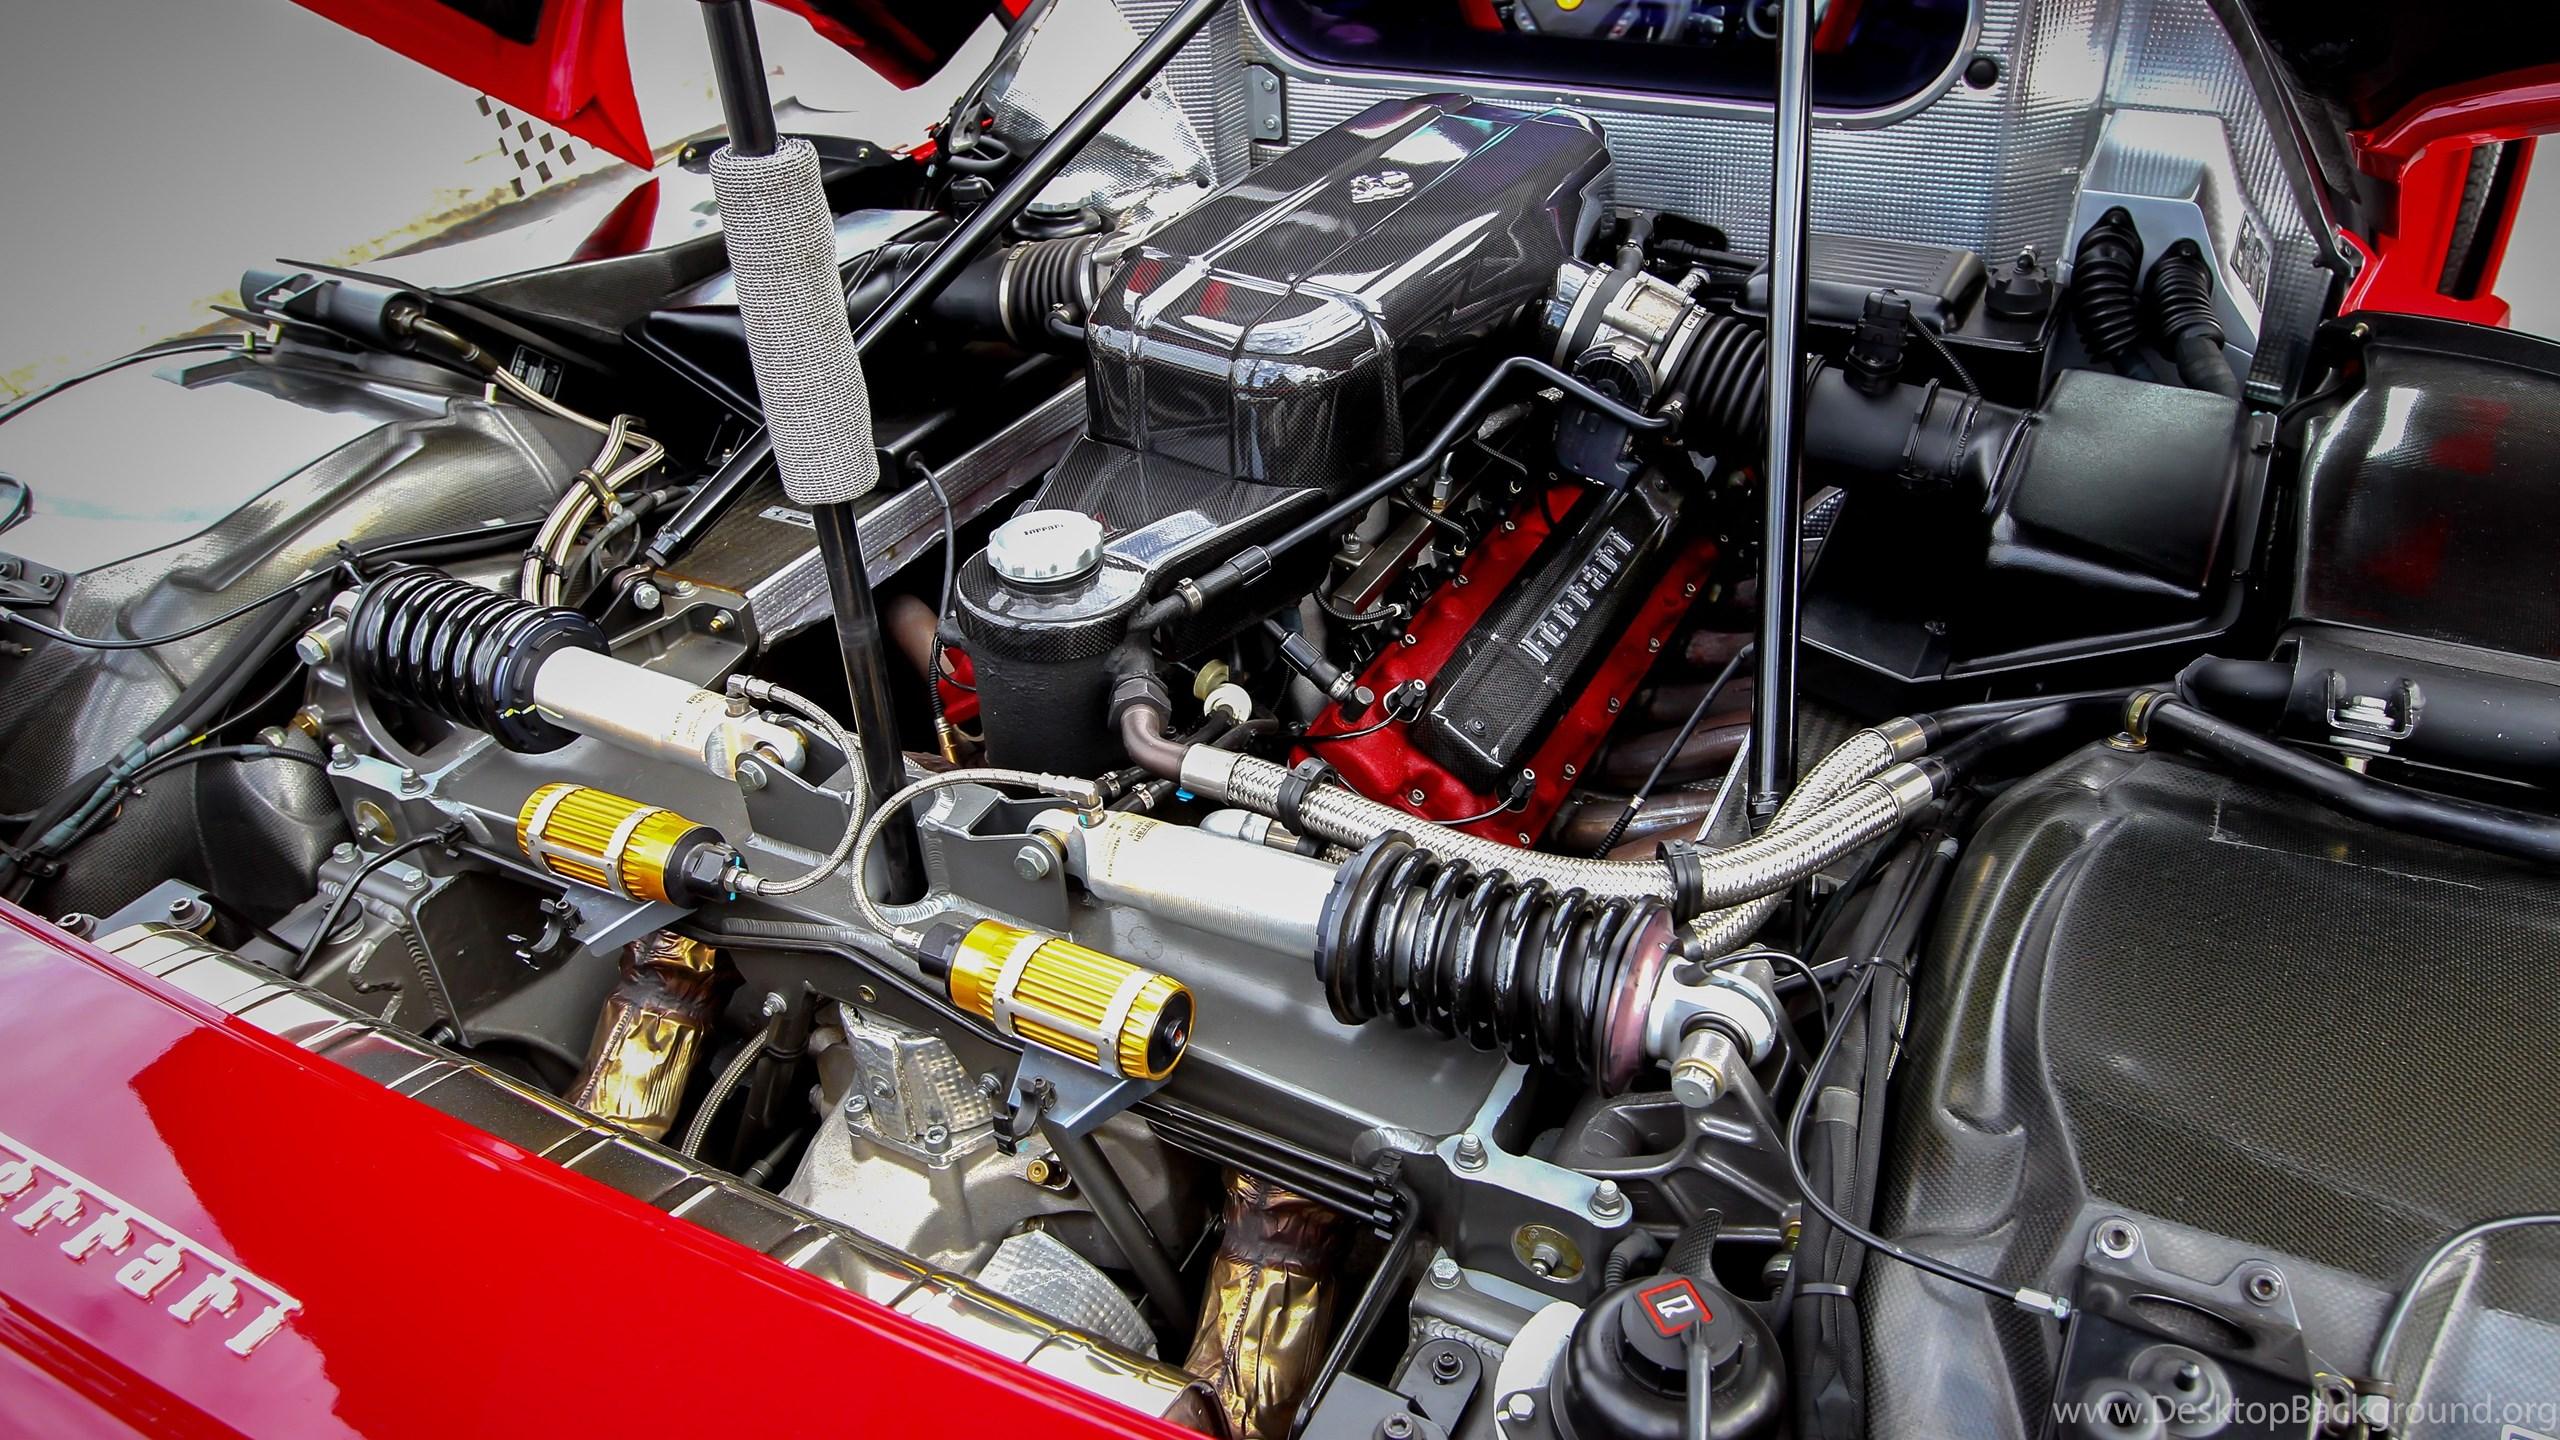 Ferrari F50 Engine Image Desktop Background